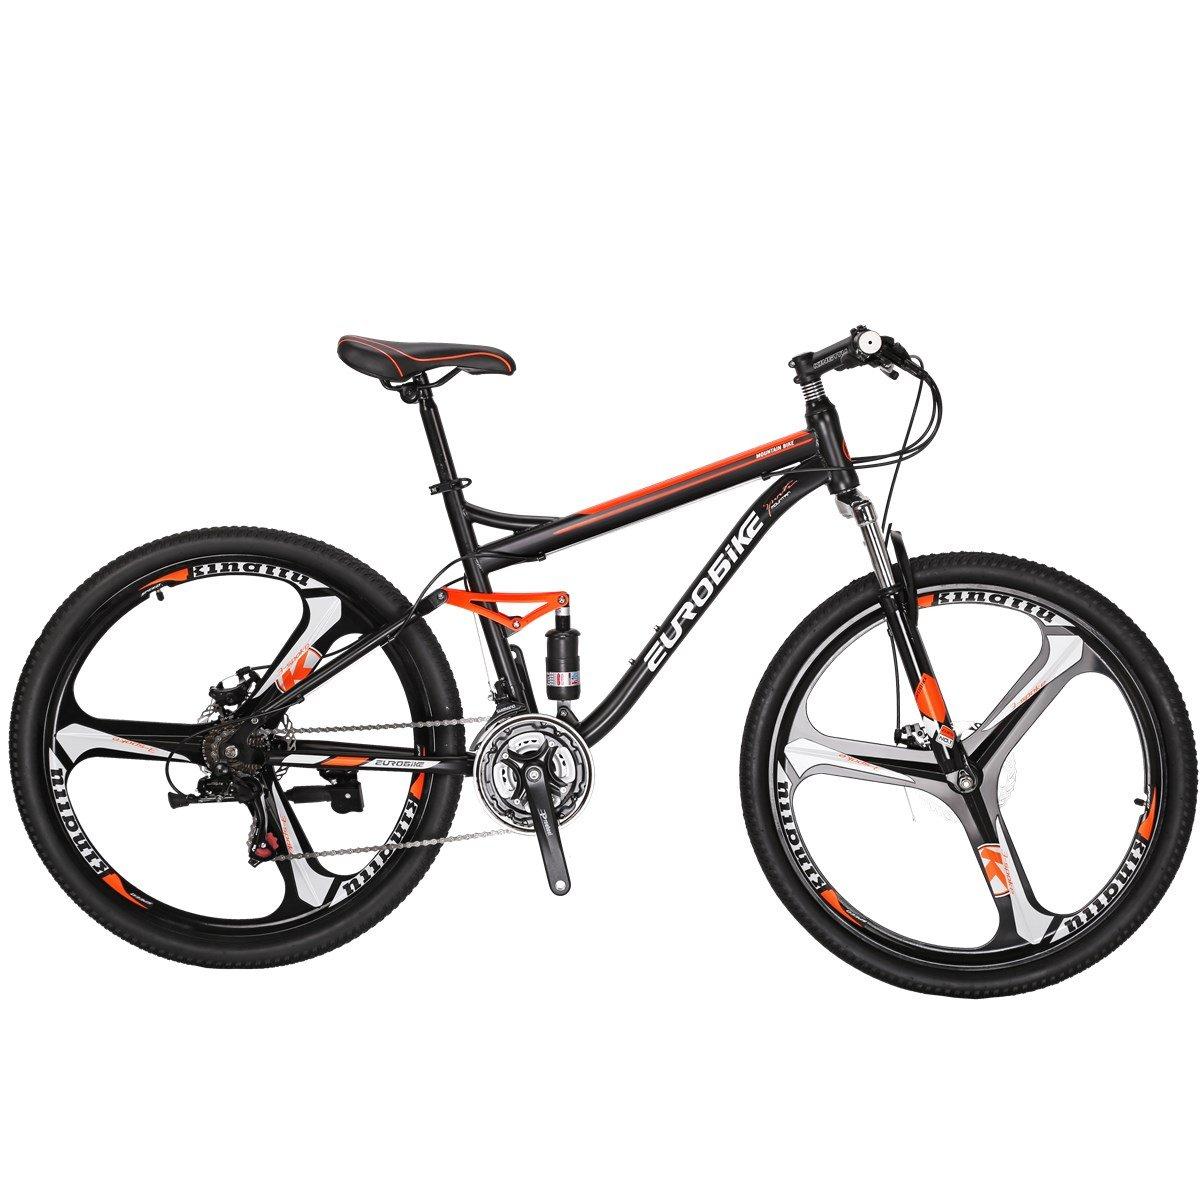 EUROBIKE Moutain Bike S7 Bicycle 21 Speed MTB 27.5 Inches Wheels Dual Suspension Bike